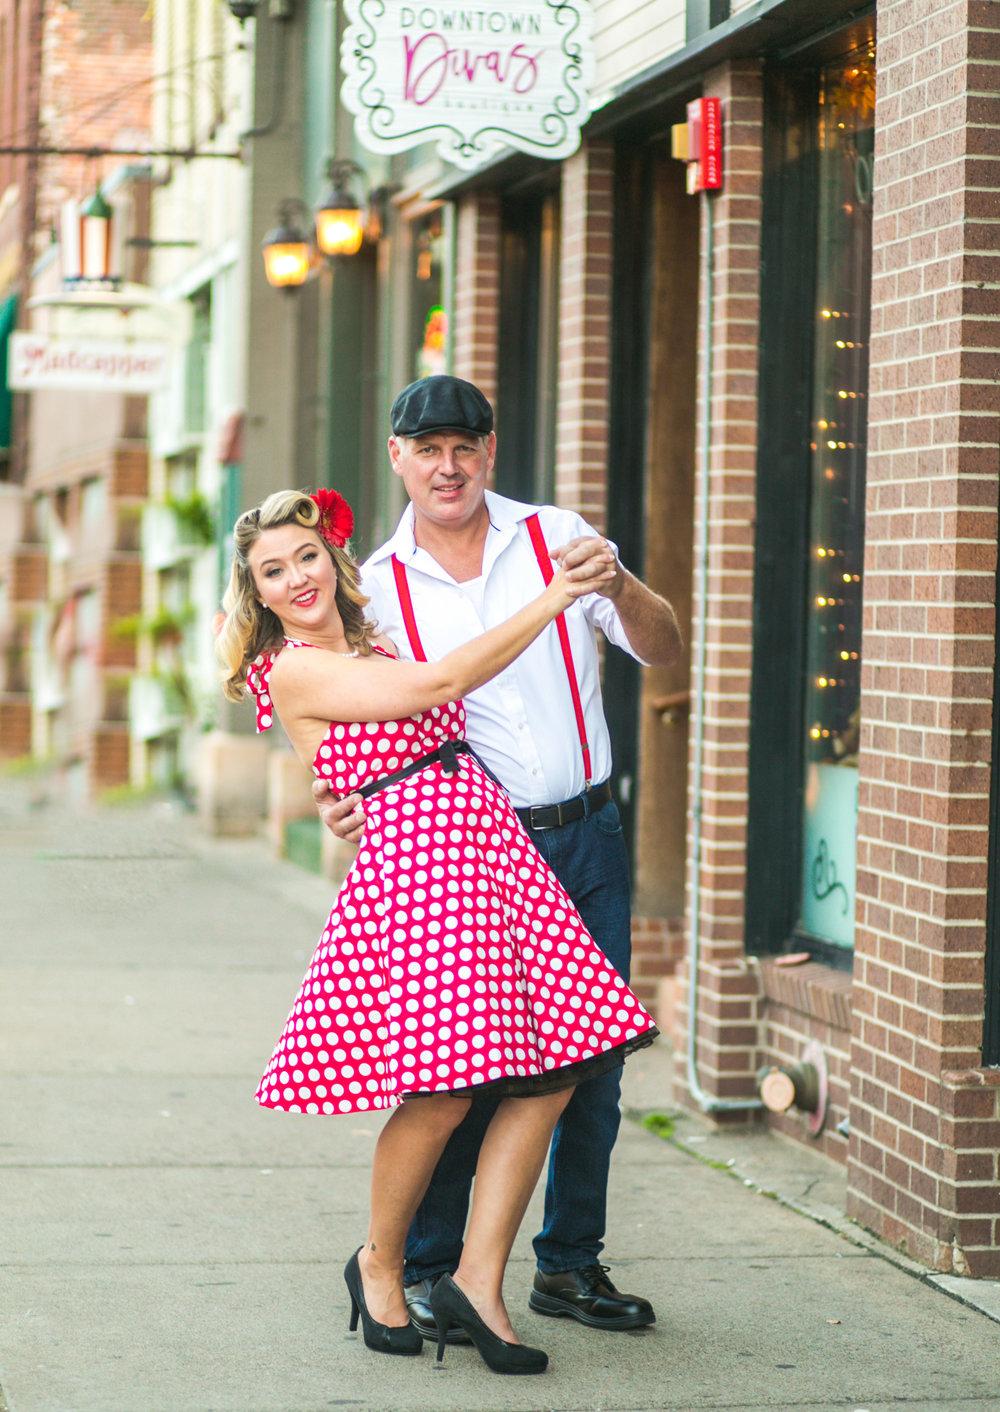 Engaged couple dances on the sidewalk in Stillwater